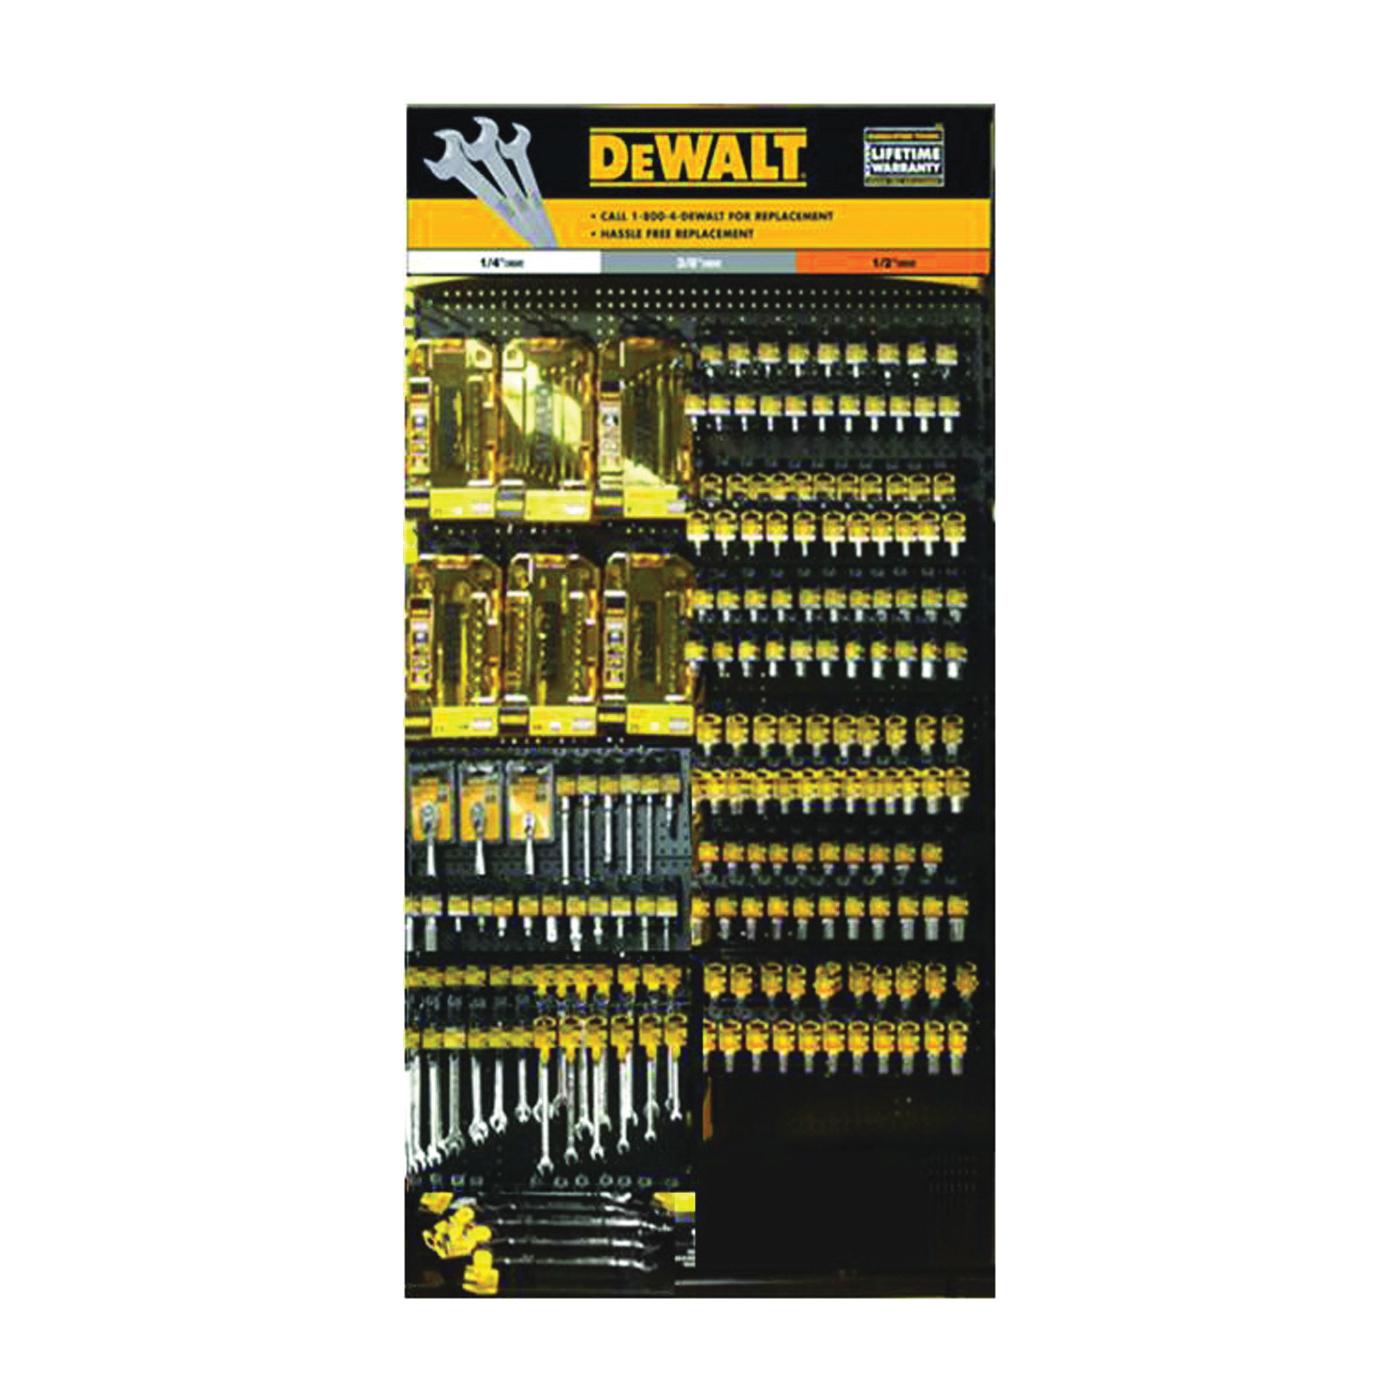 Picture of DeWALT DWMT74204 Socket Set, Specifications: 1/4 in Drive Size